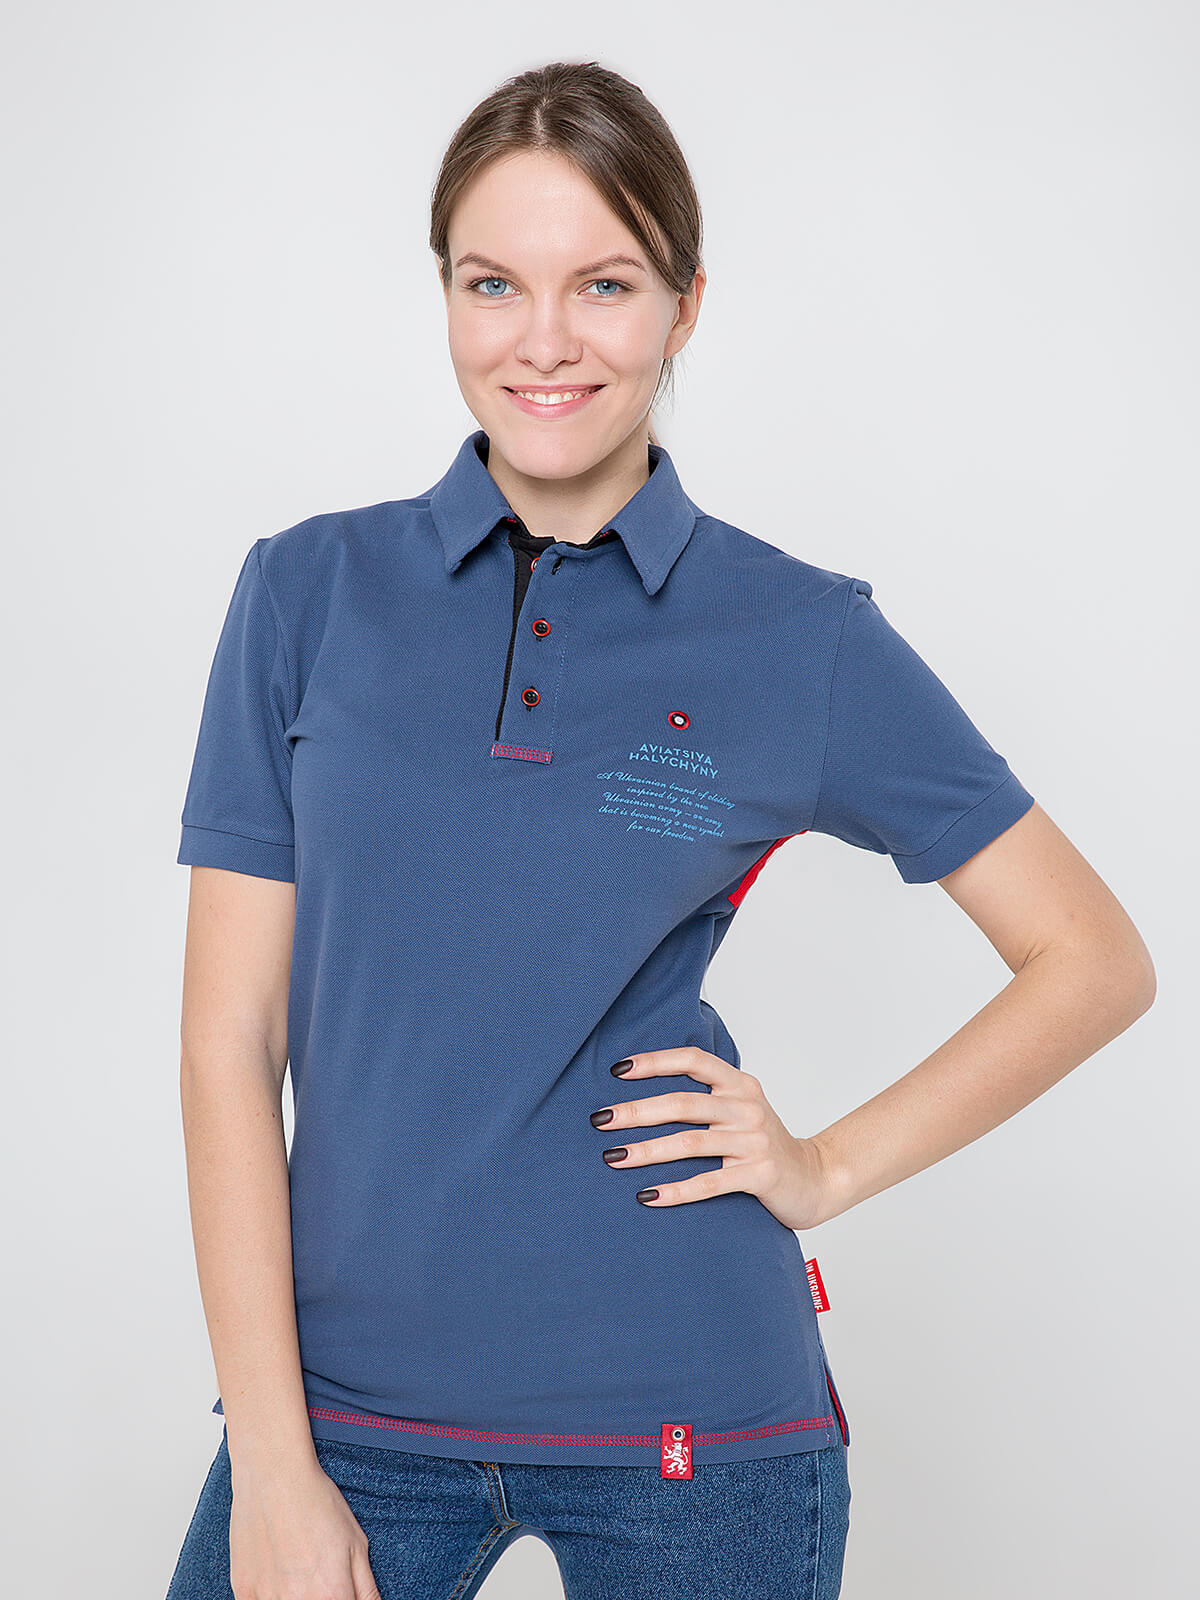 Women's Polo Shirt Wings. Color denim. Unisex polo (men's sizes).